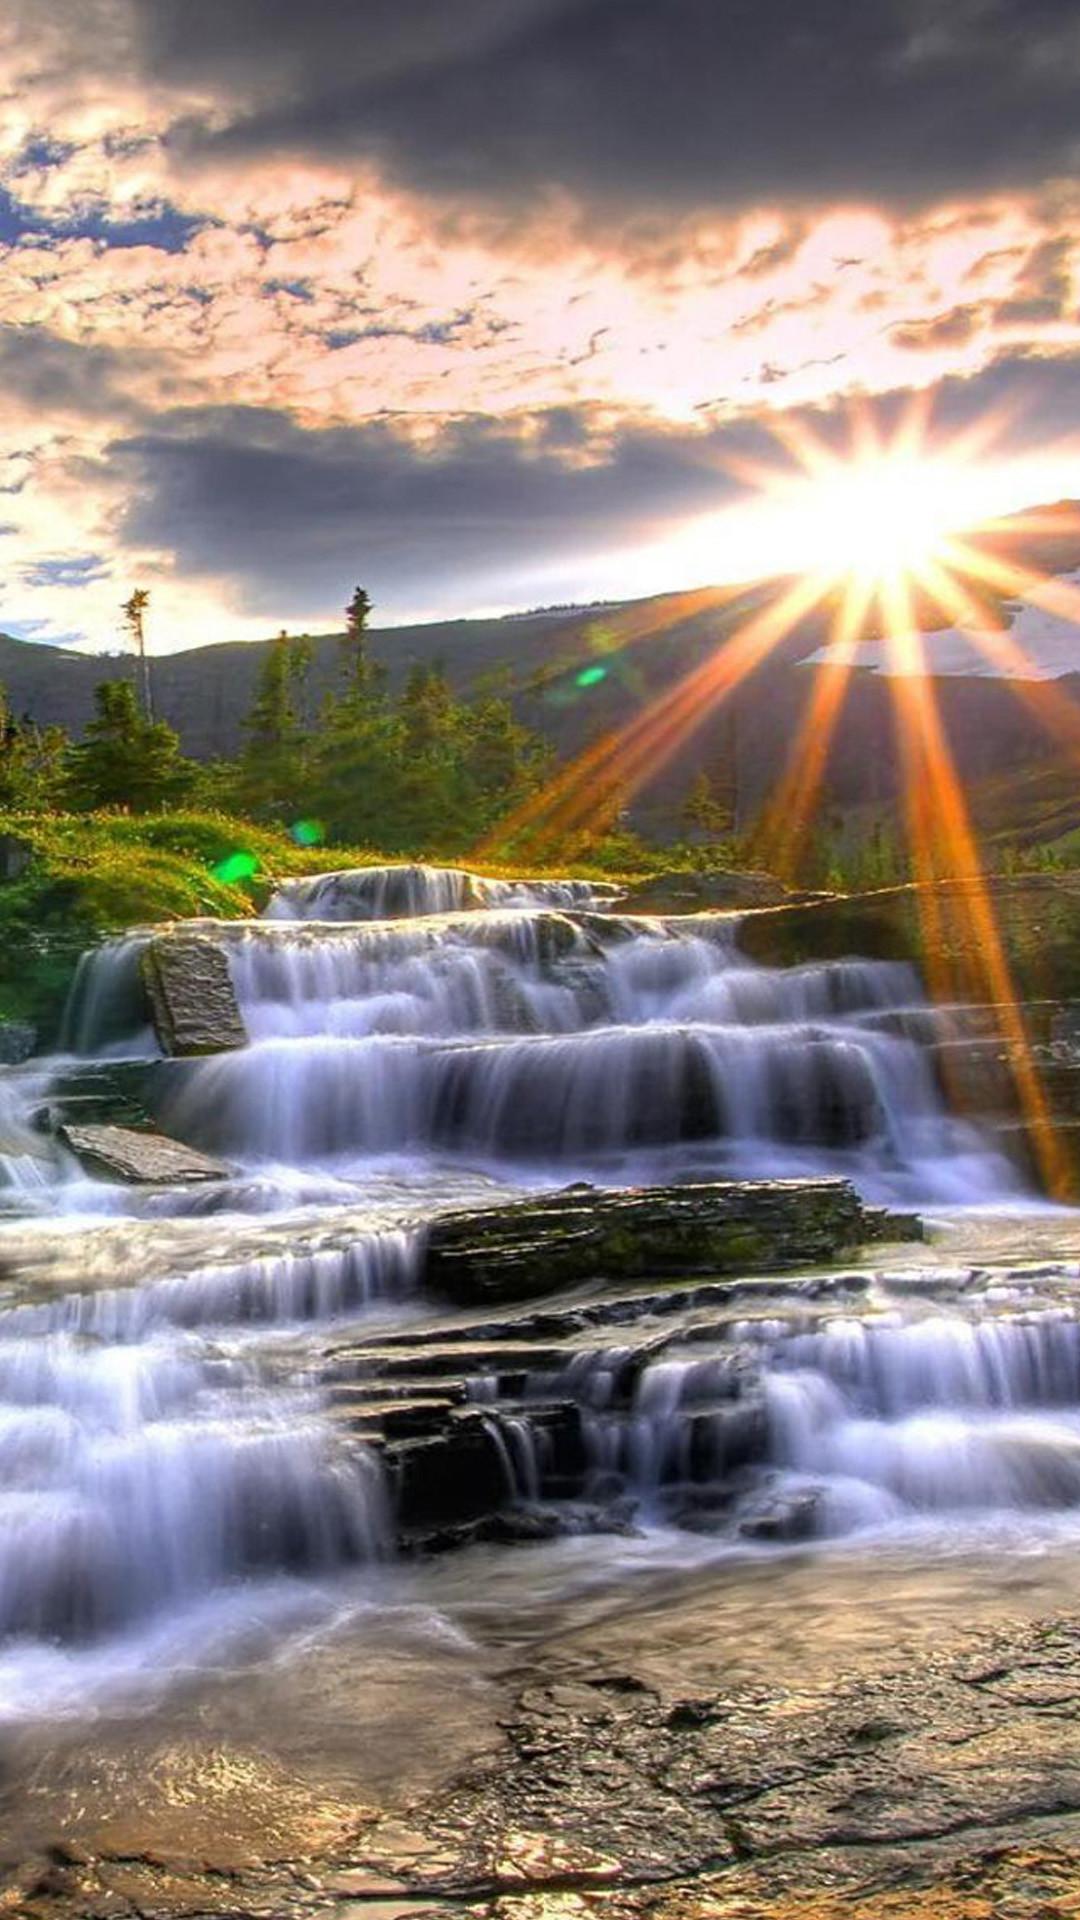 Beauty Girl Wallpapers Download Beautiful Waterfall Wallpaper 50 Images